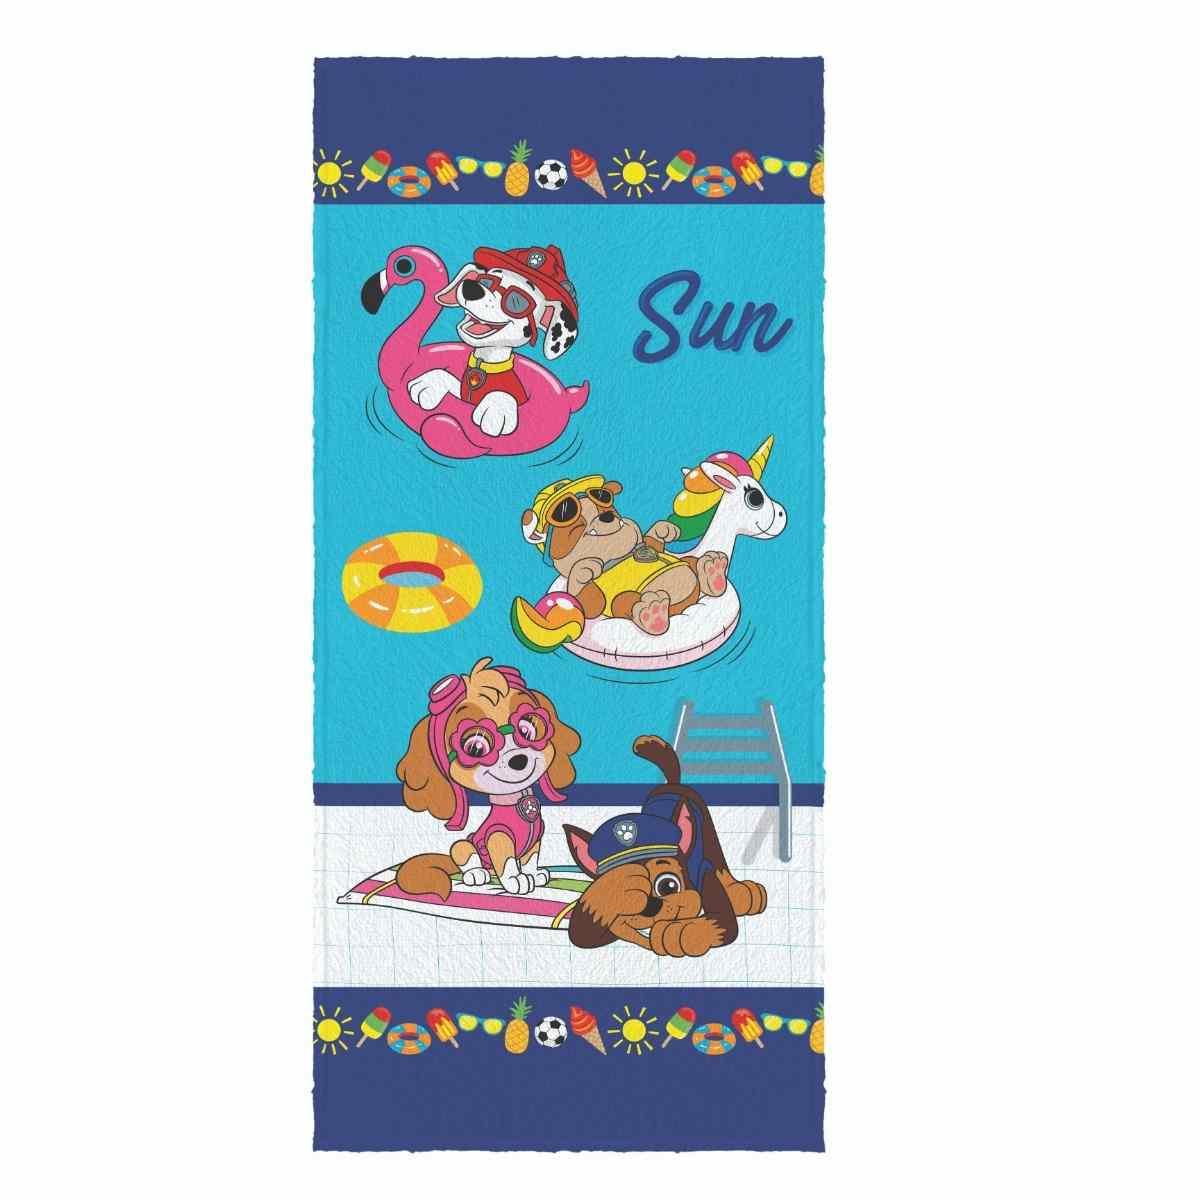 Toalha Banho Infantil Felpuda 60x120 Patrulha Canina Est 5